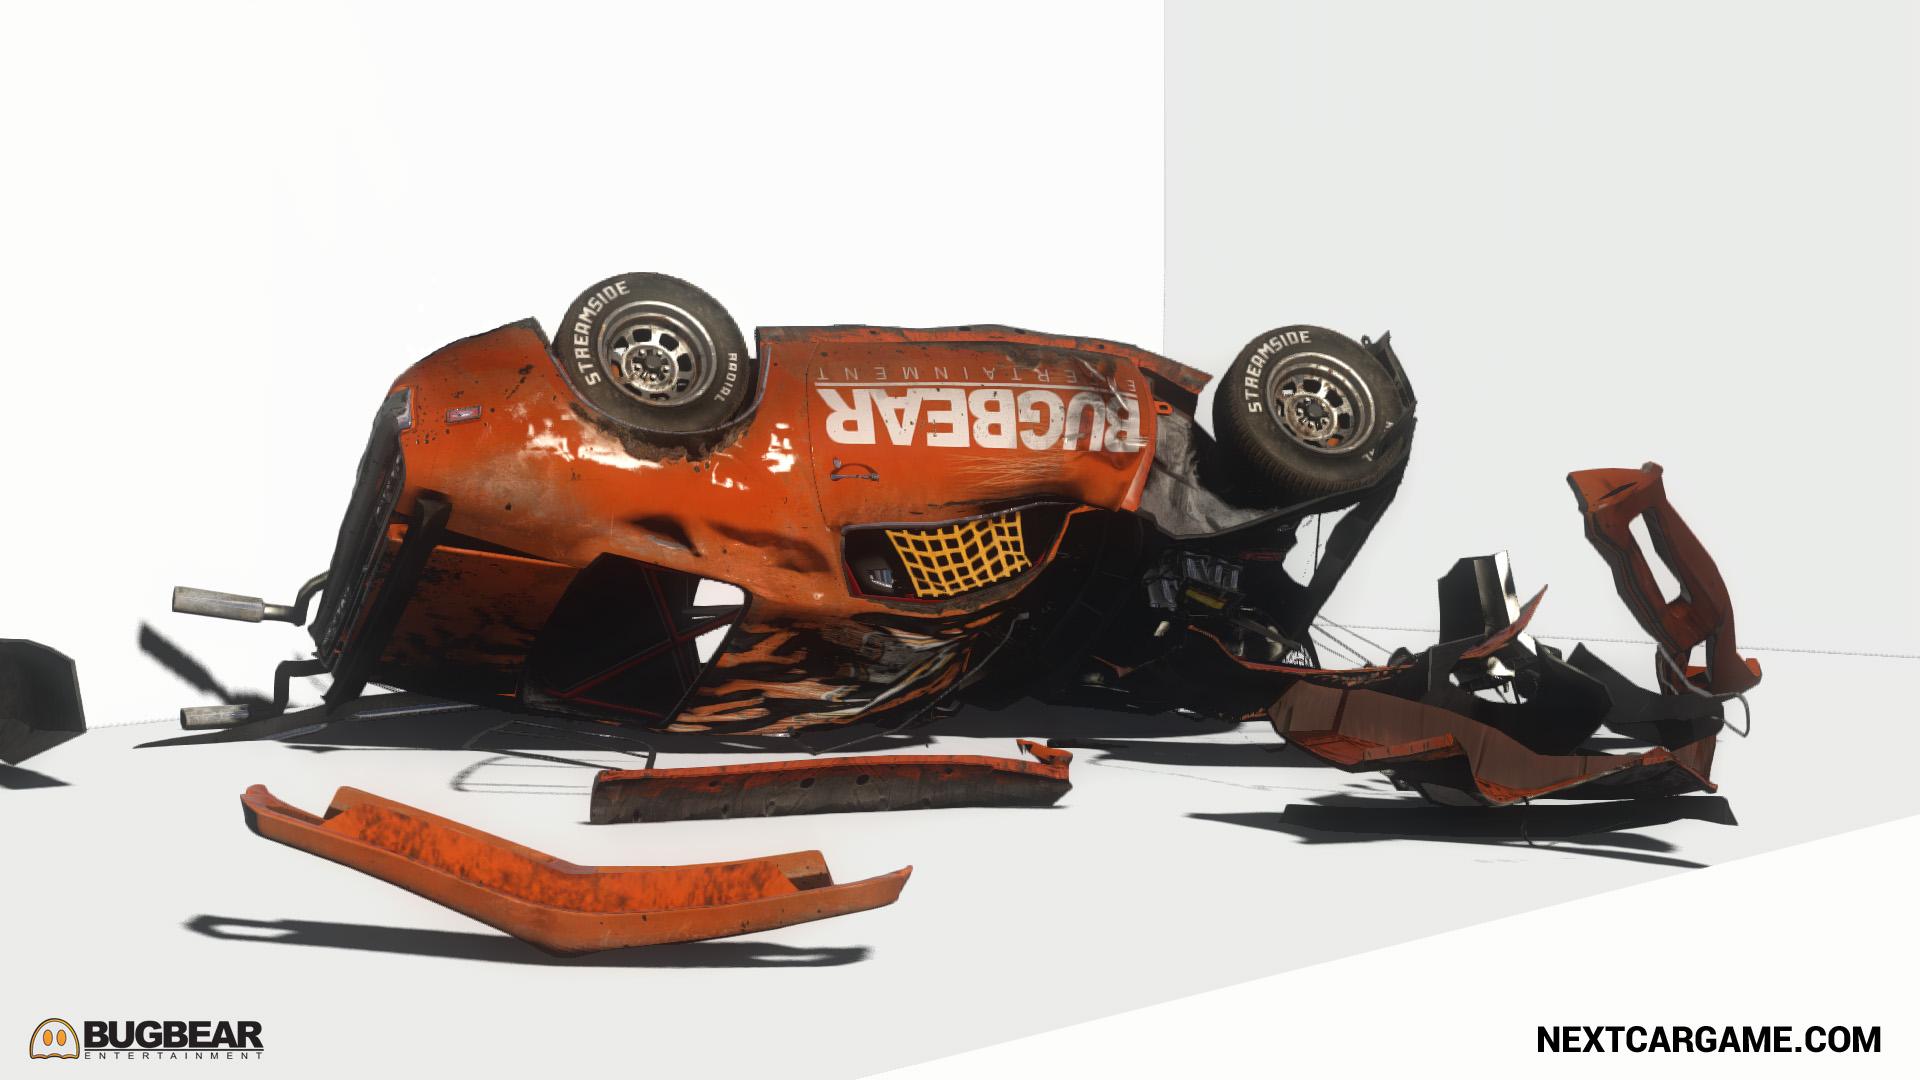 Next Car Game Technology Demo gameplay: crashing cars in creative ways